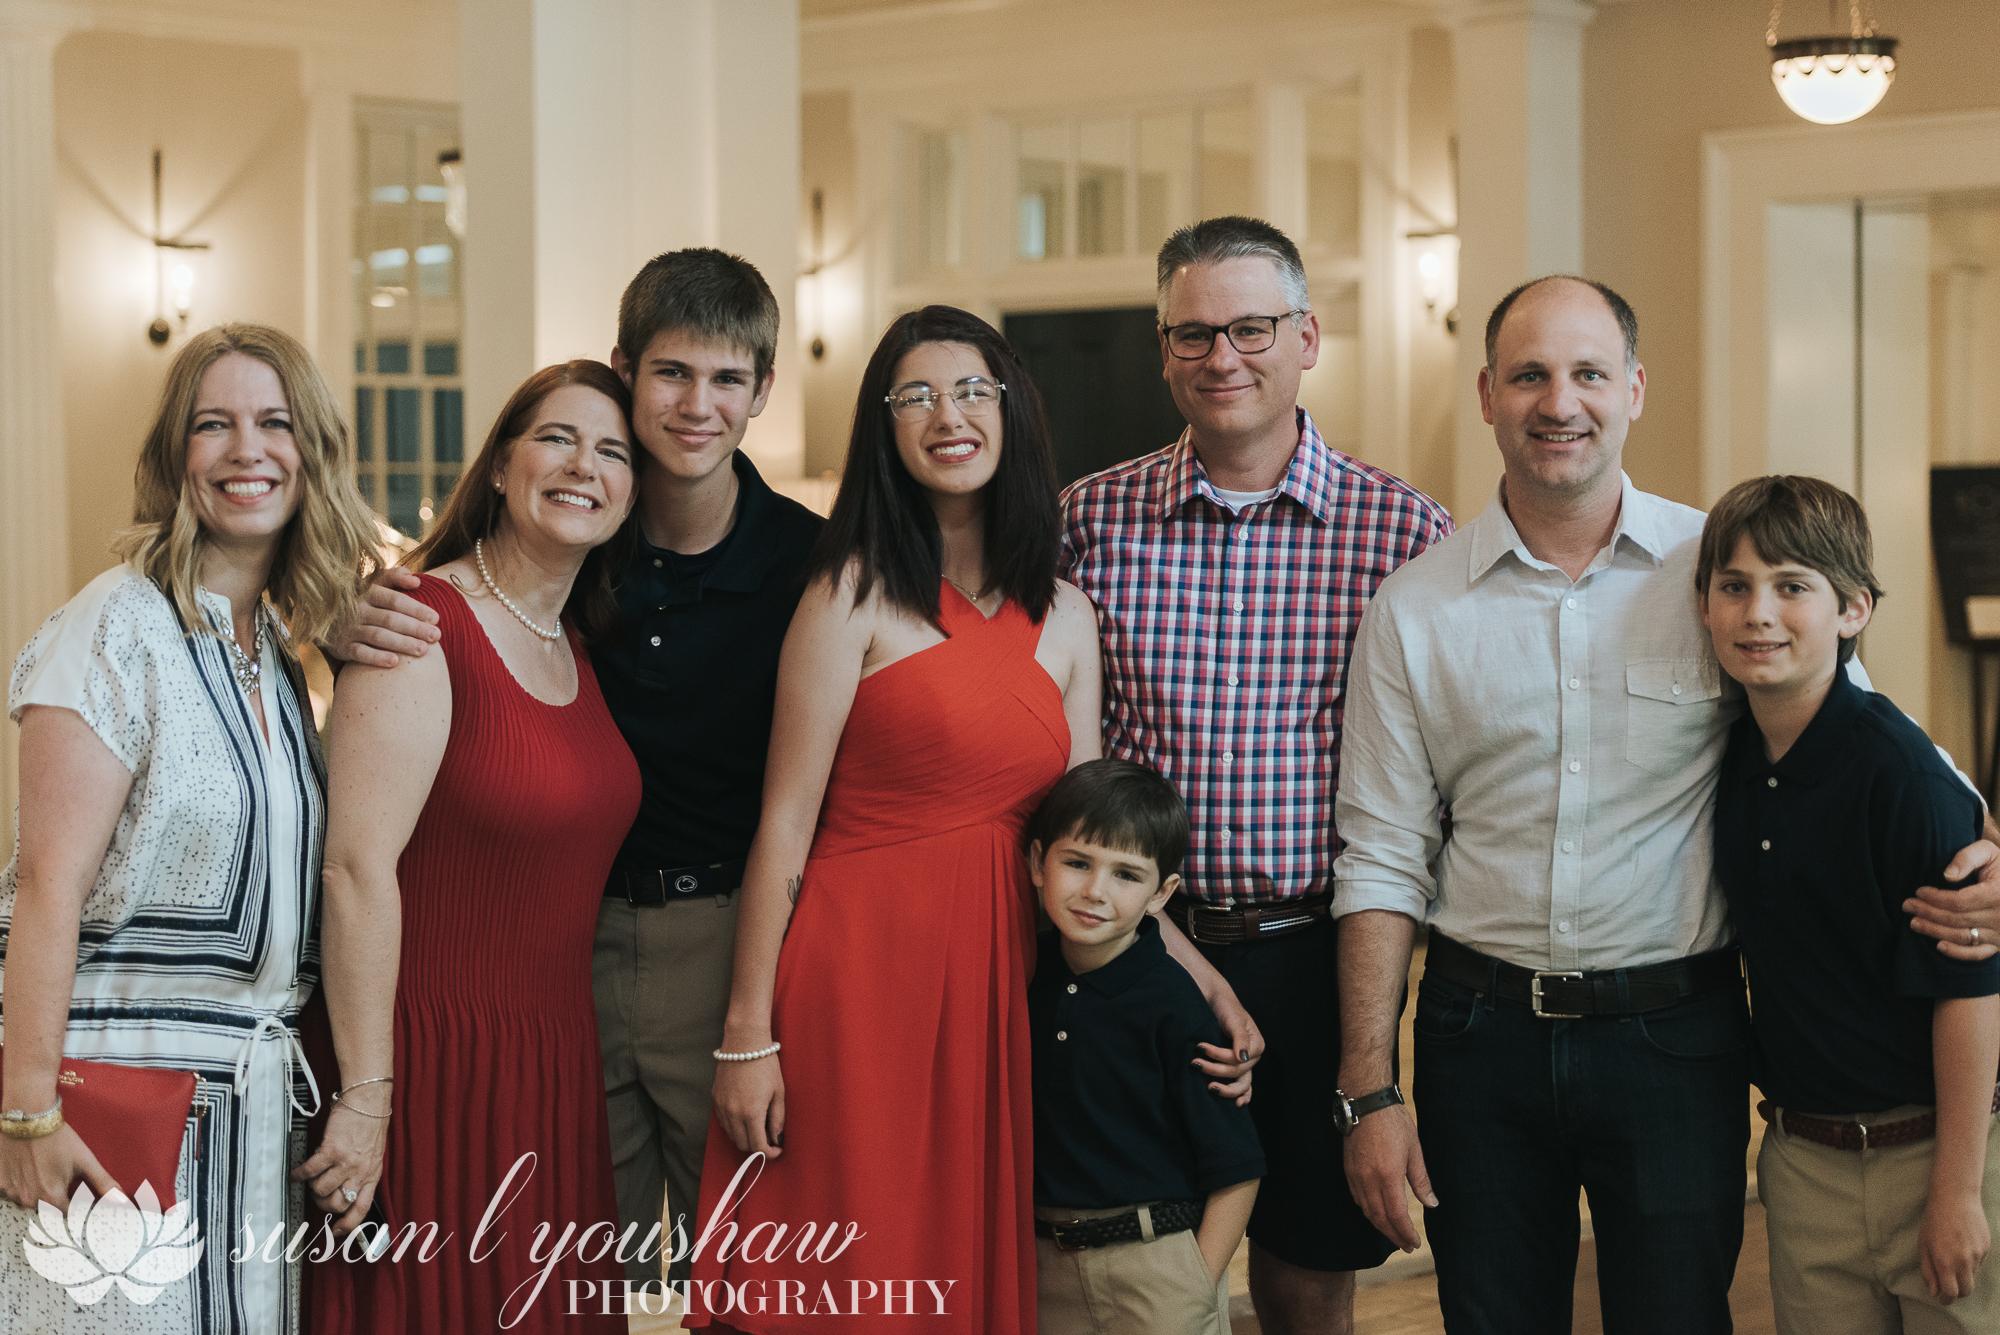 BLOG Carolyn Adams and Jim McCune 07-04-2018 SLY Photography-43.jpg